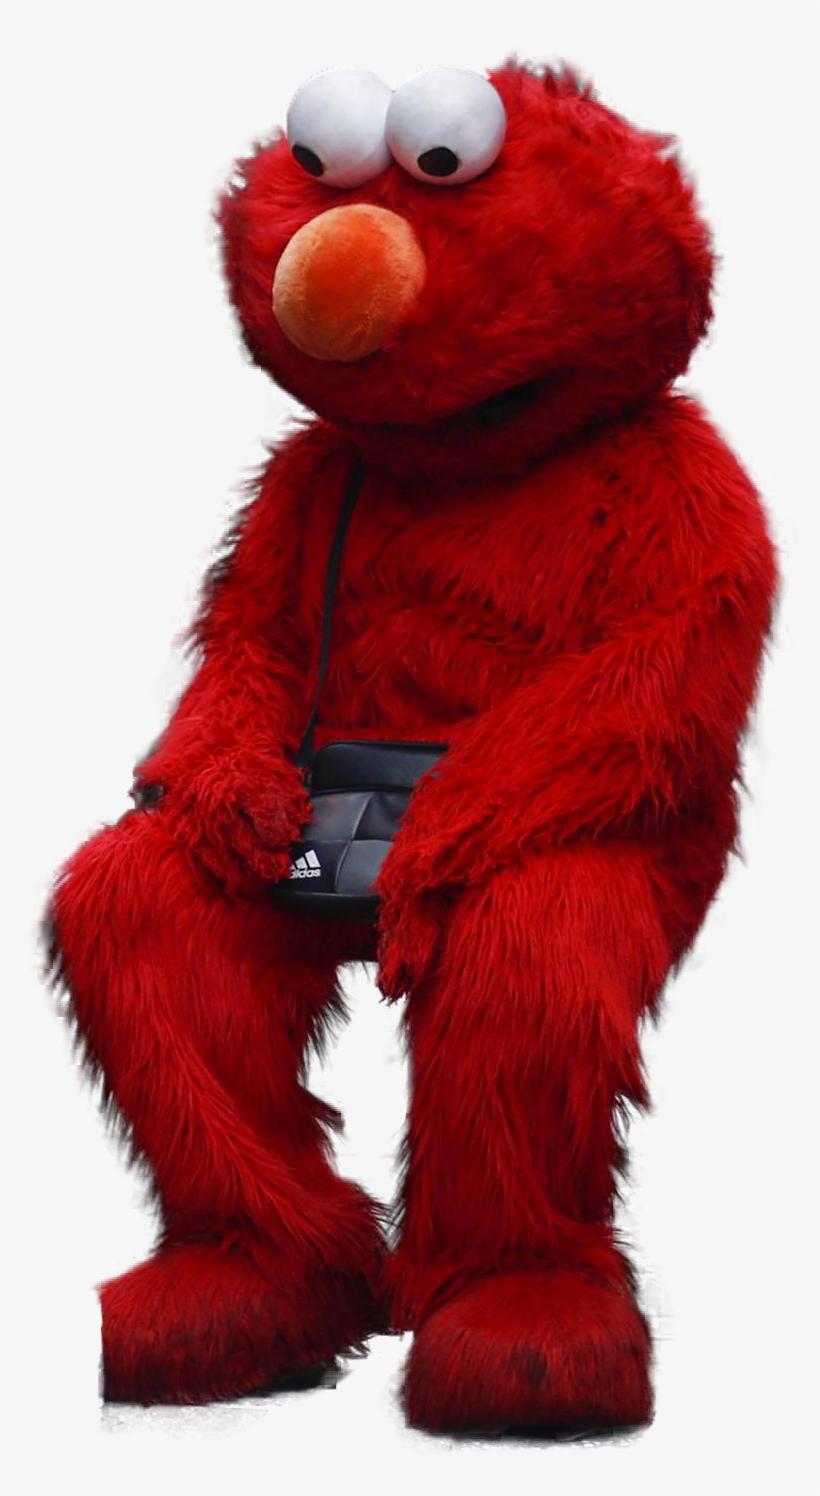 Elmo Meme Png Clip Art Download Elmo Vs Kermit Free